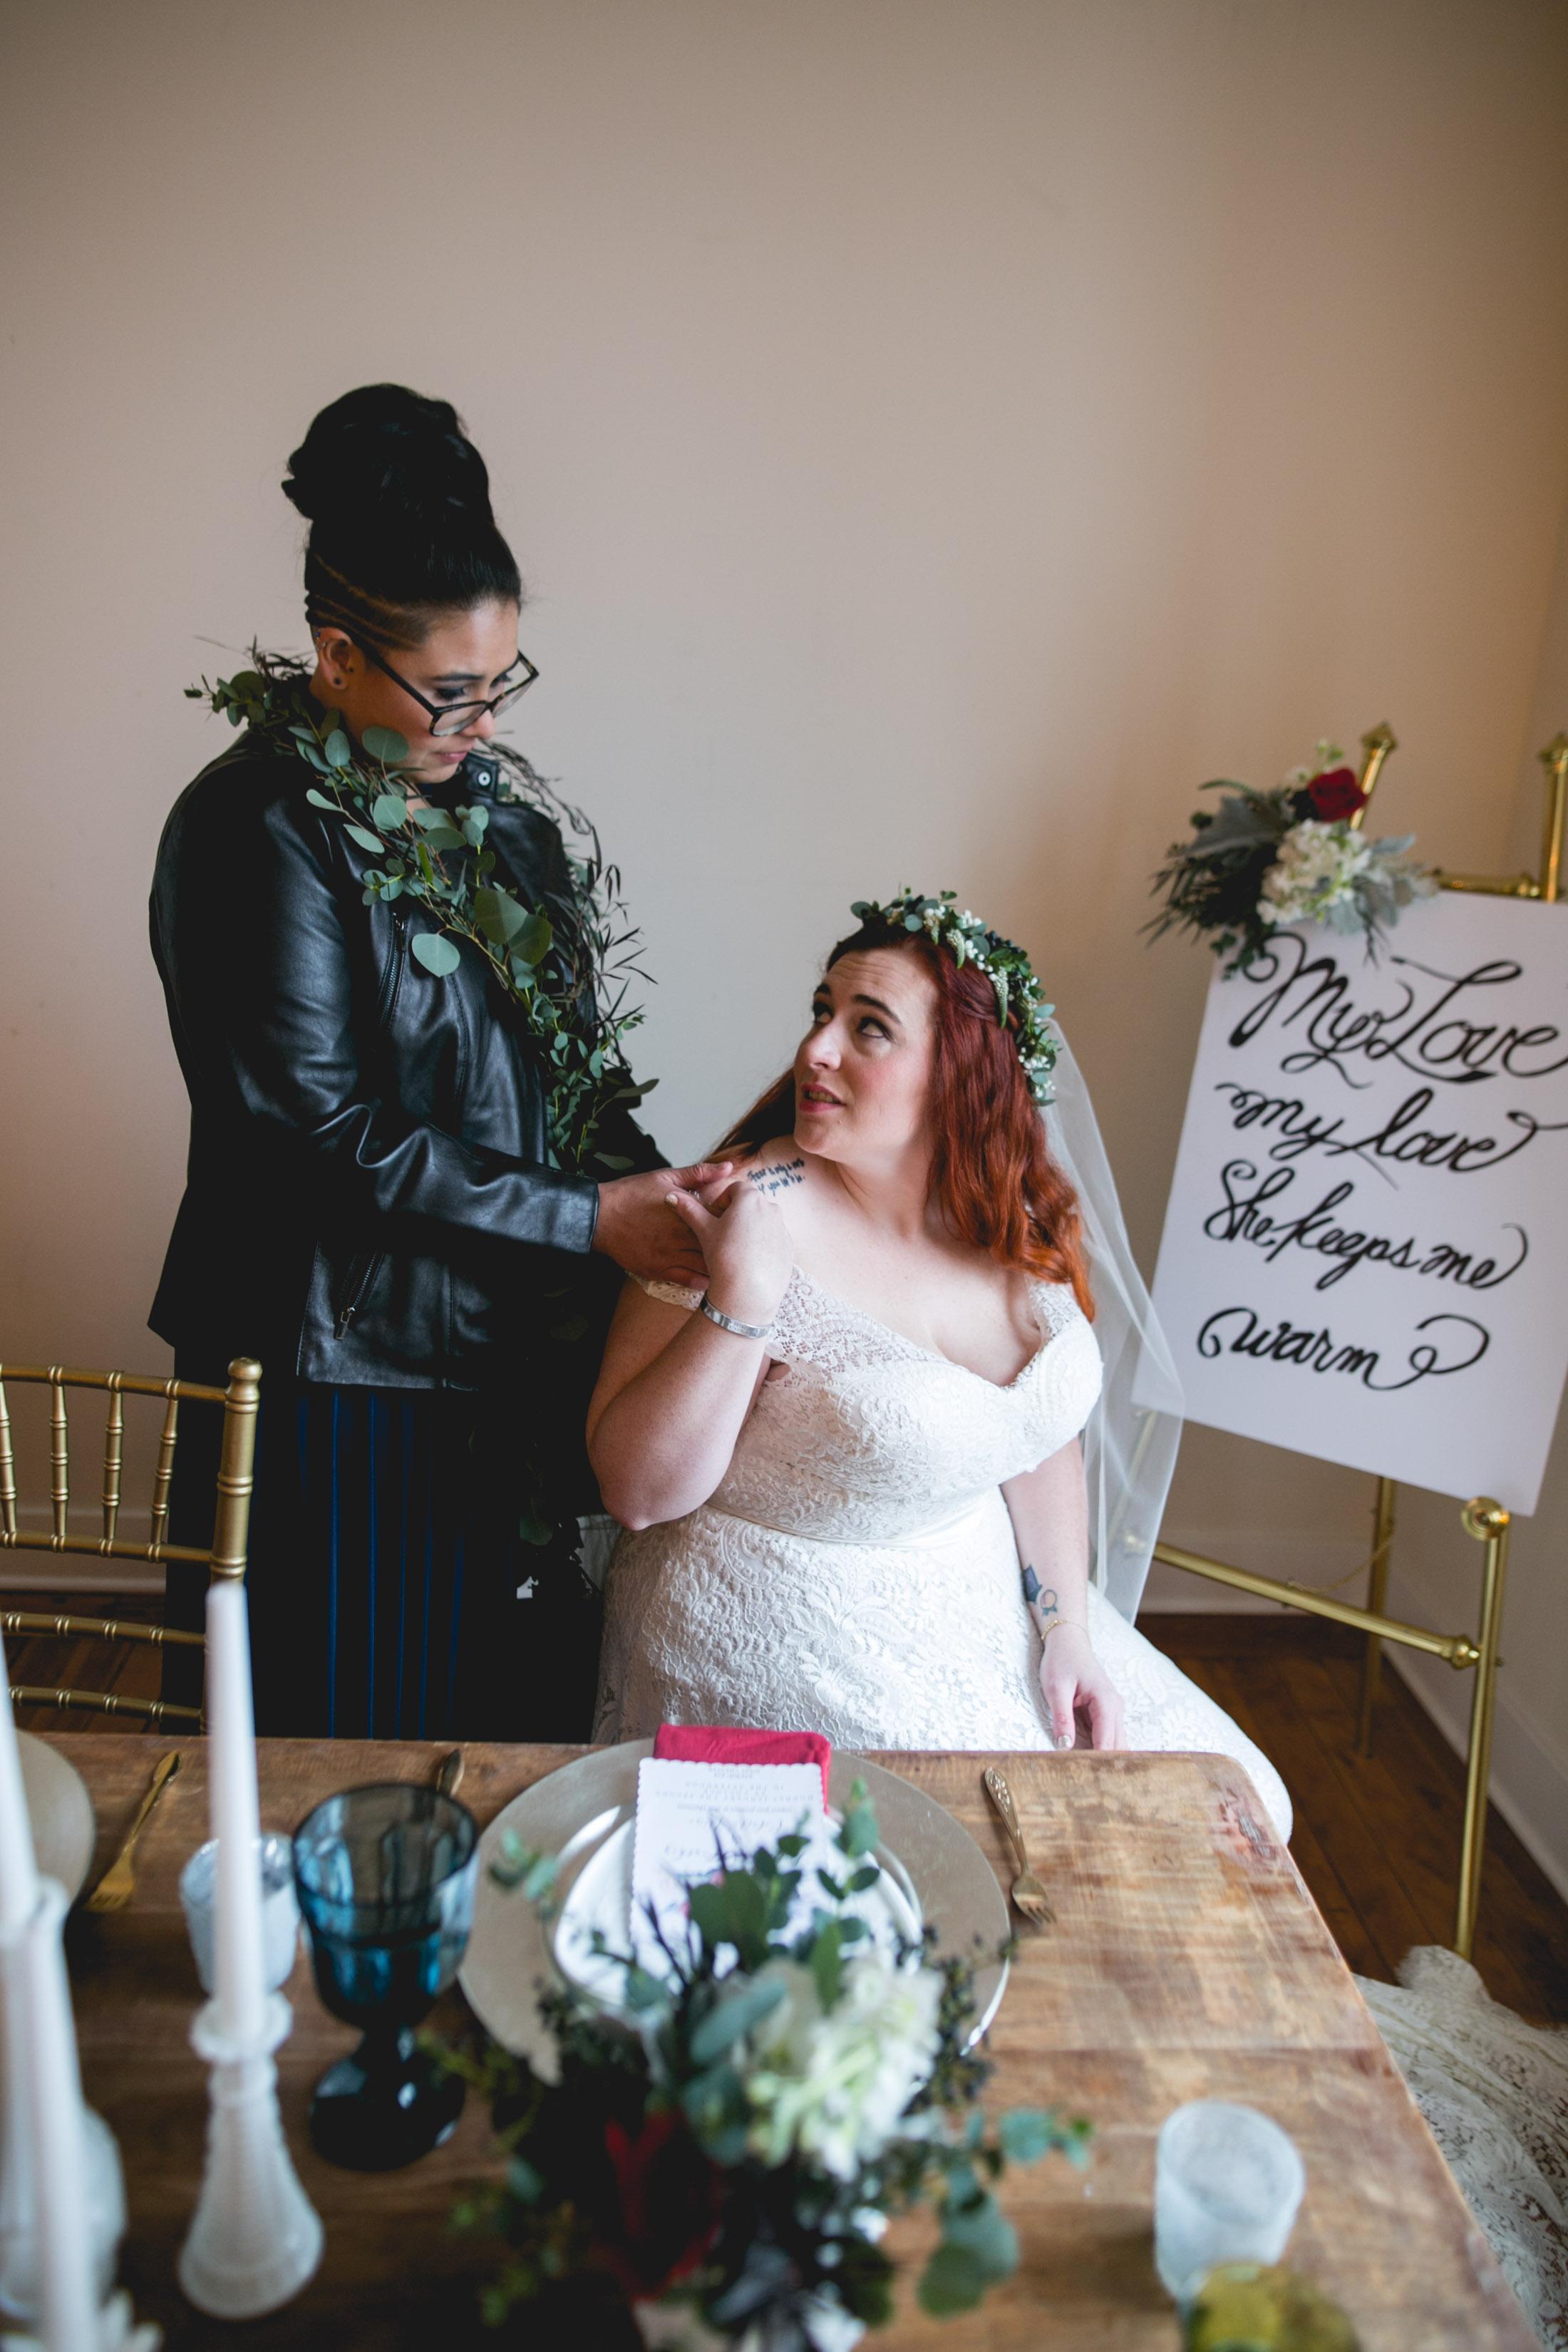 LGBTQ Philadelphia Wedding by Swiger Photography the Lesbian photographer 25